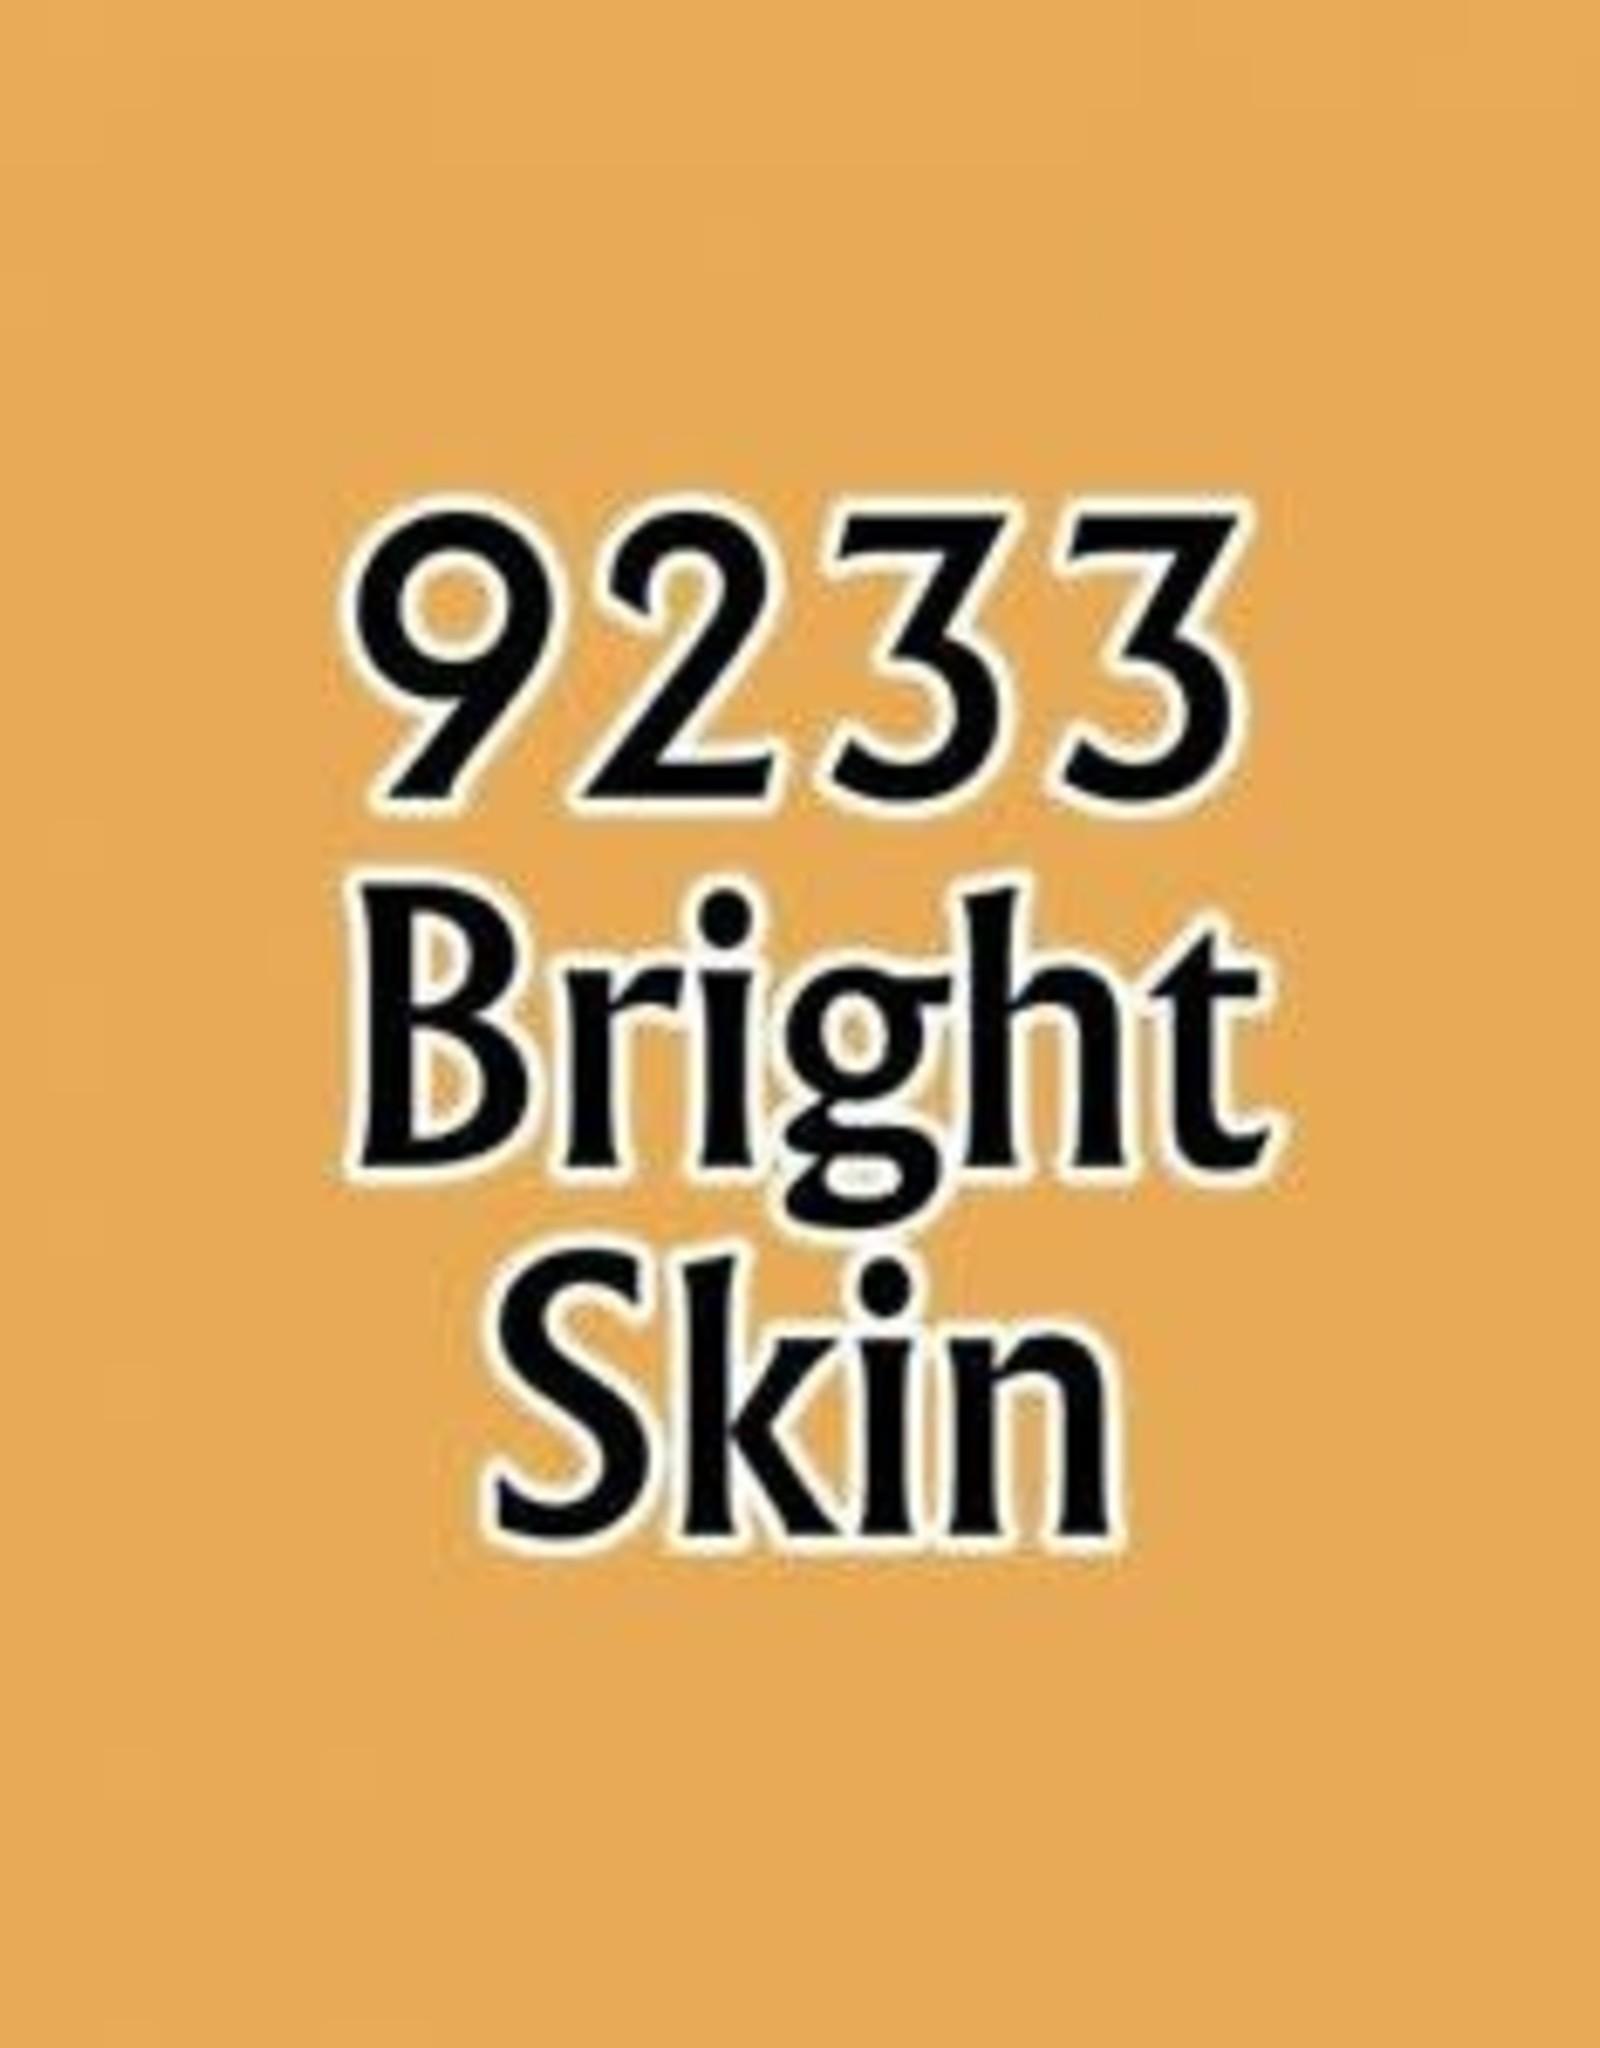 Reaper Bright Skin